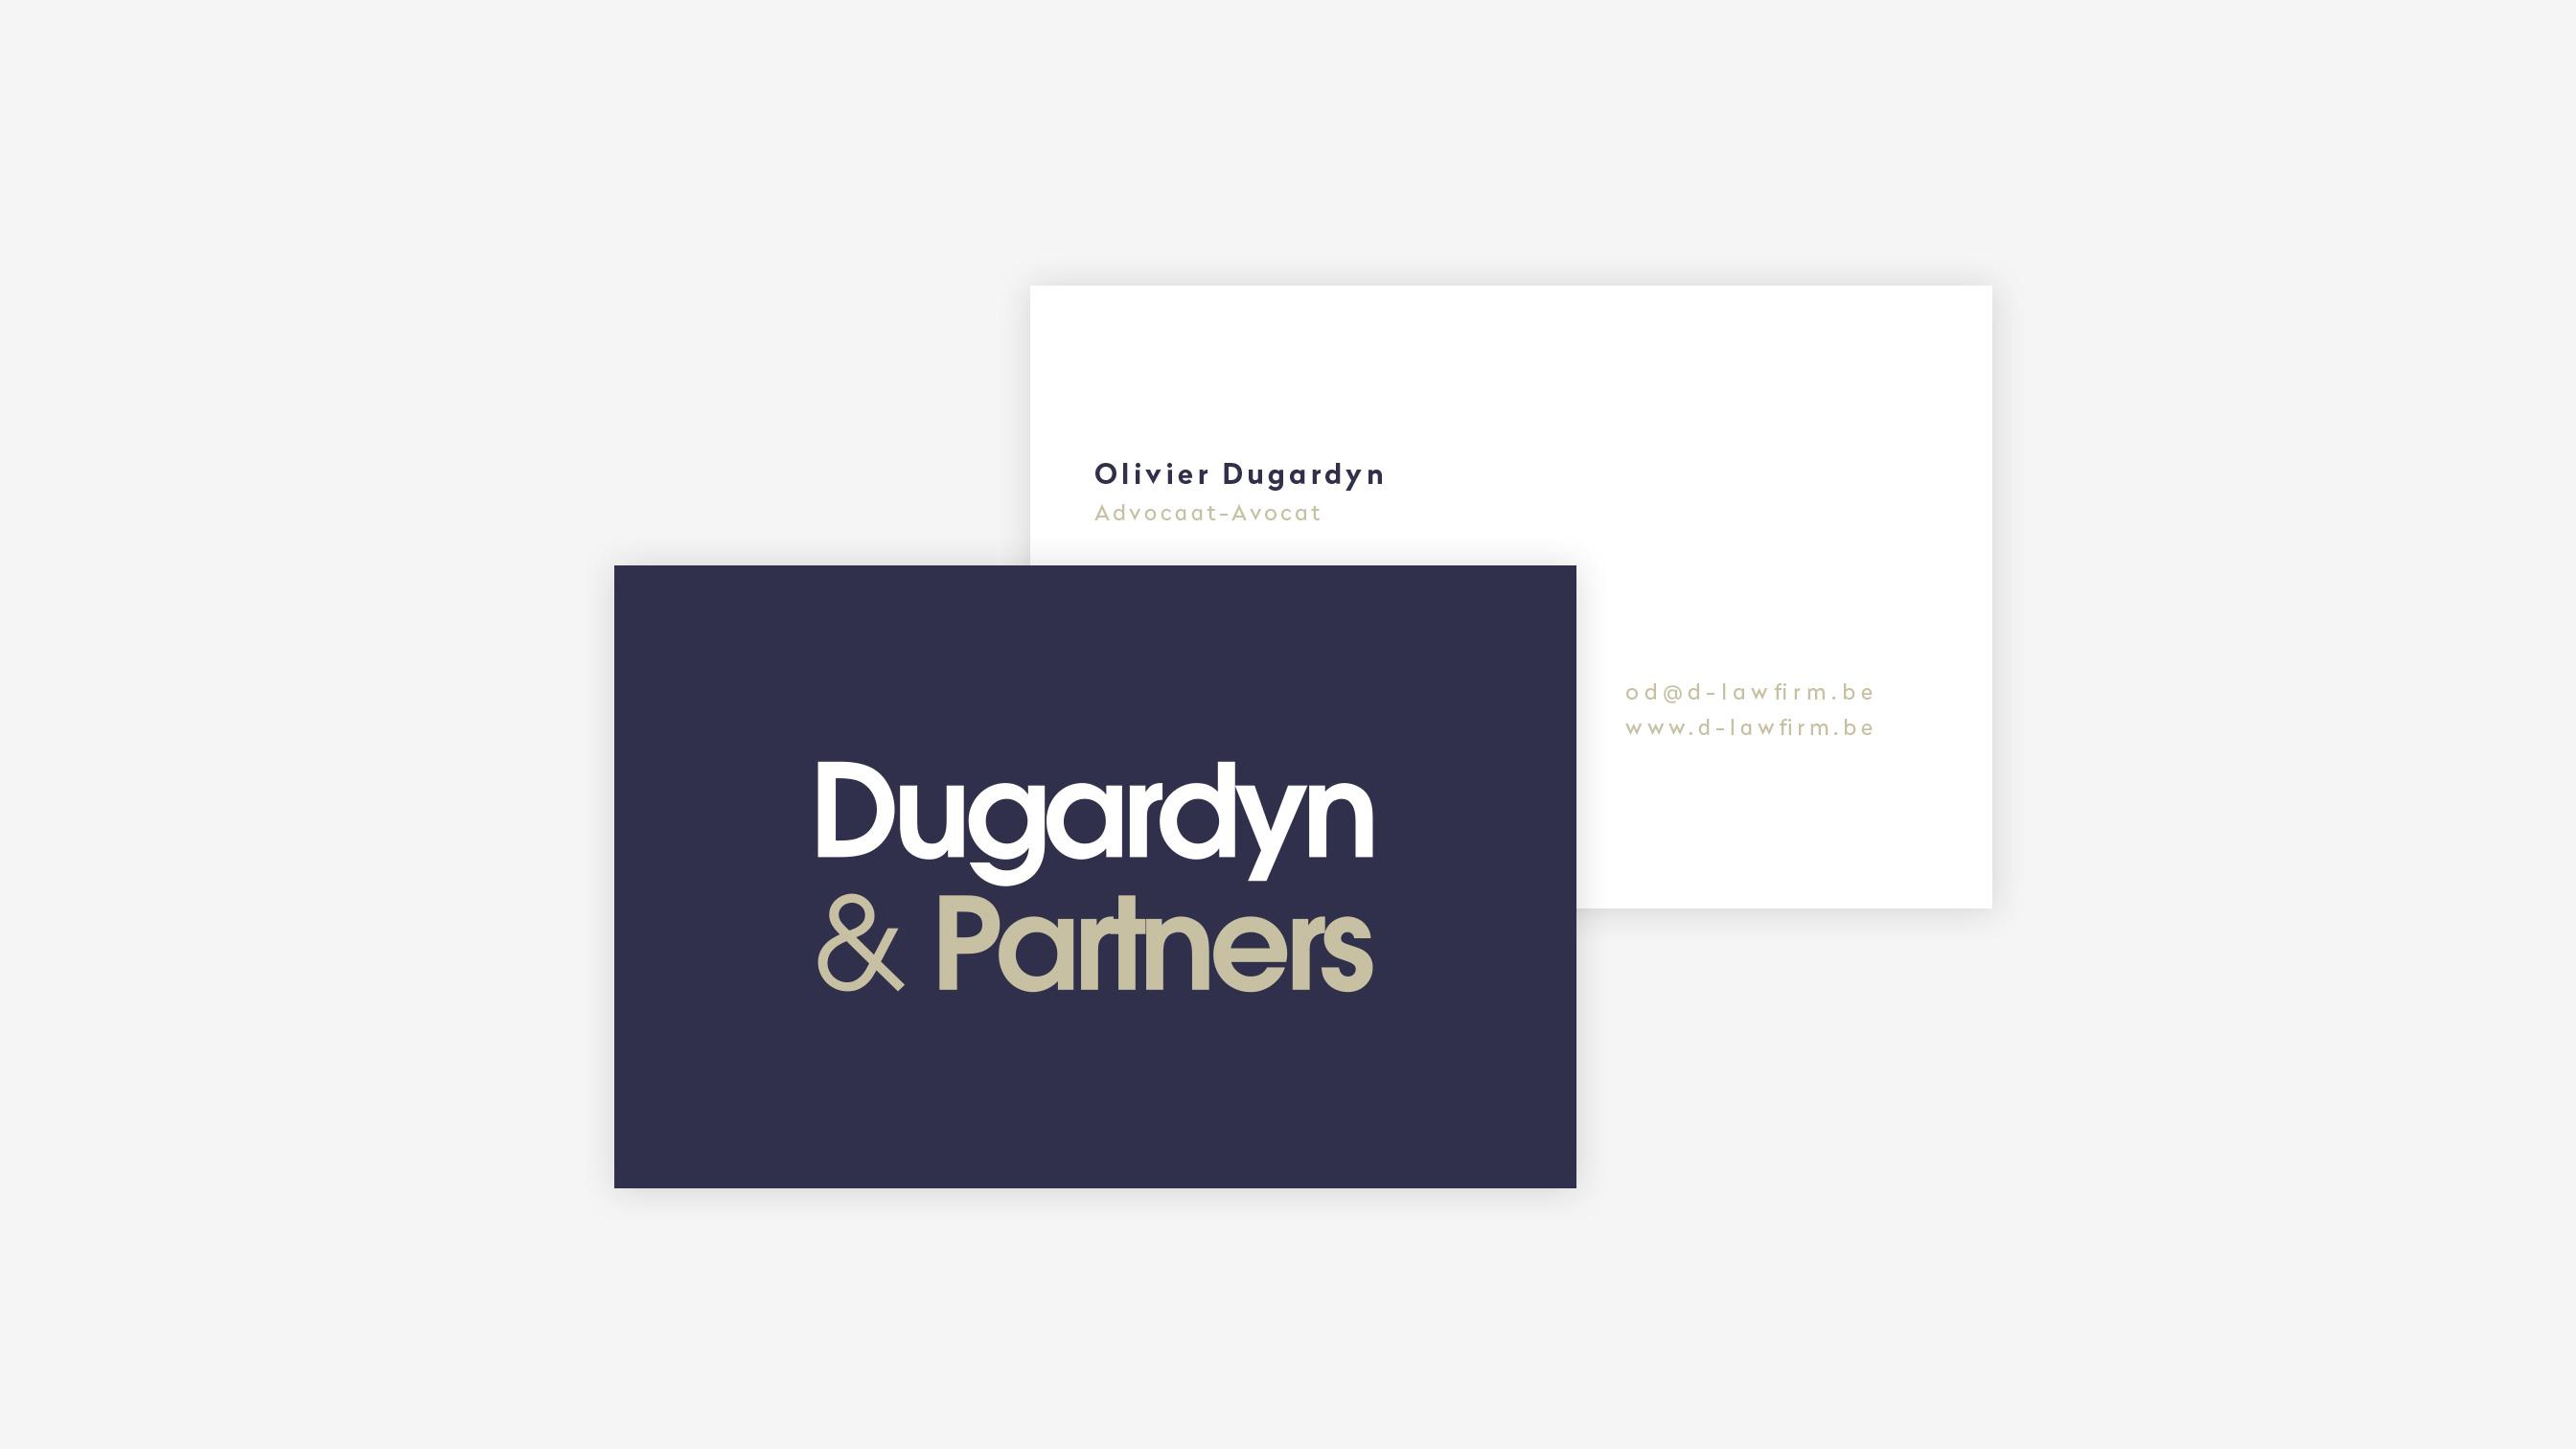 03-dugardyn-et-partners-pikteo-webdesign-graphic-design-freelance-paris-bruxelles-londres